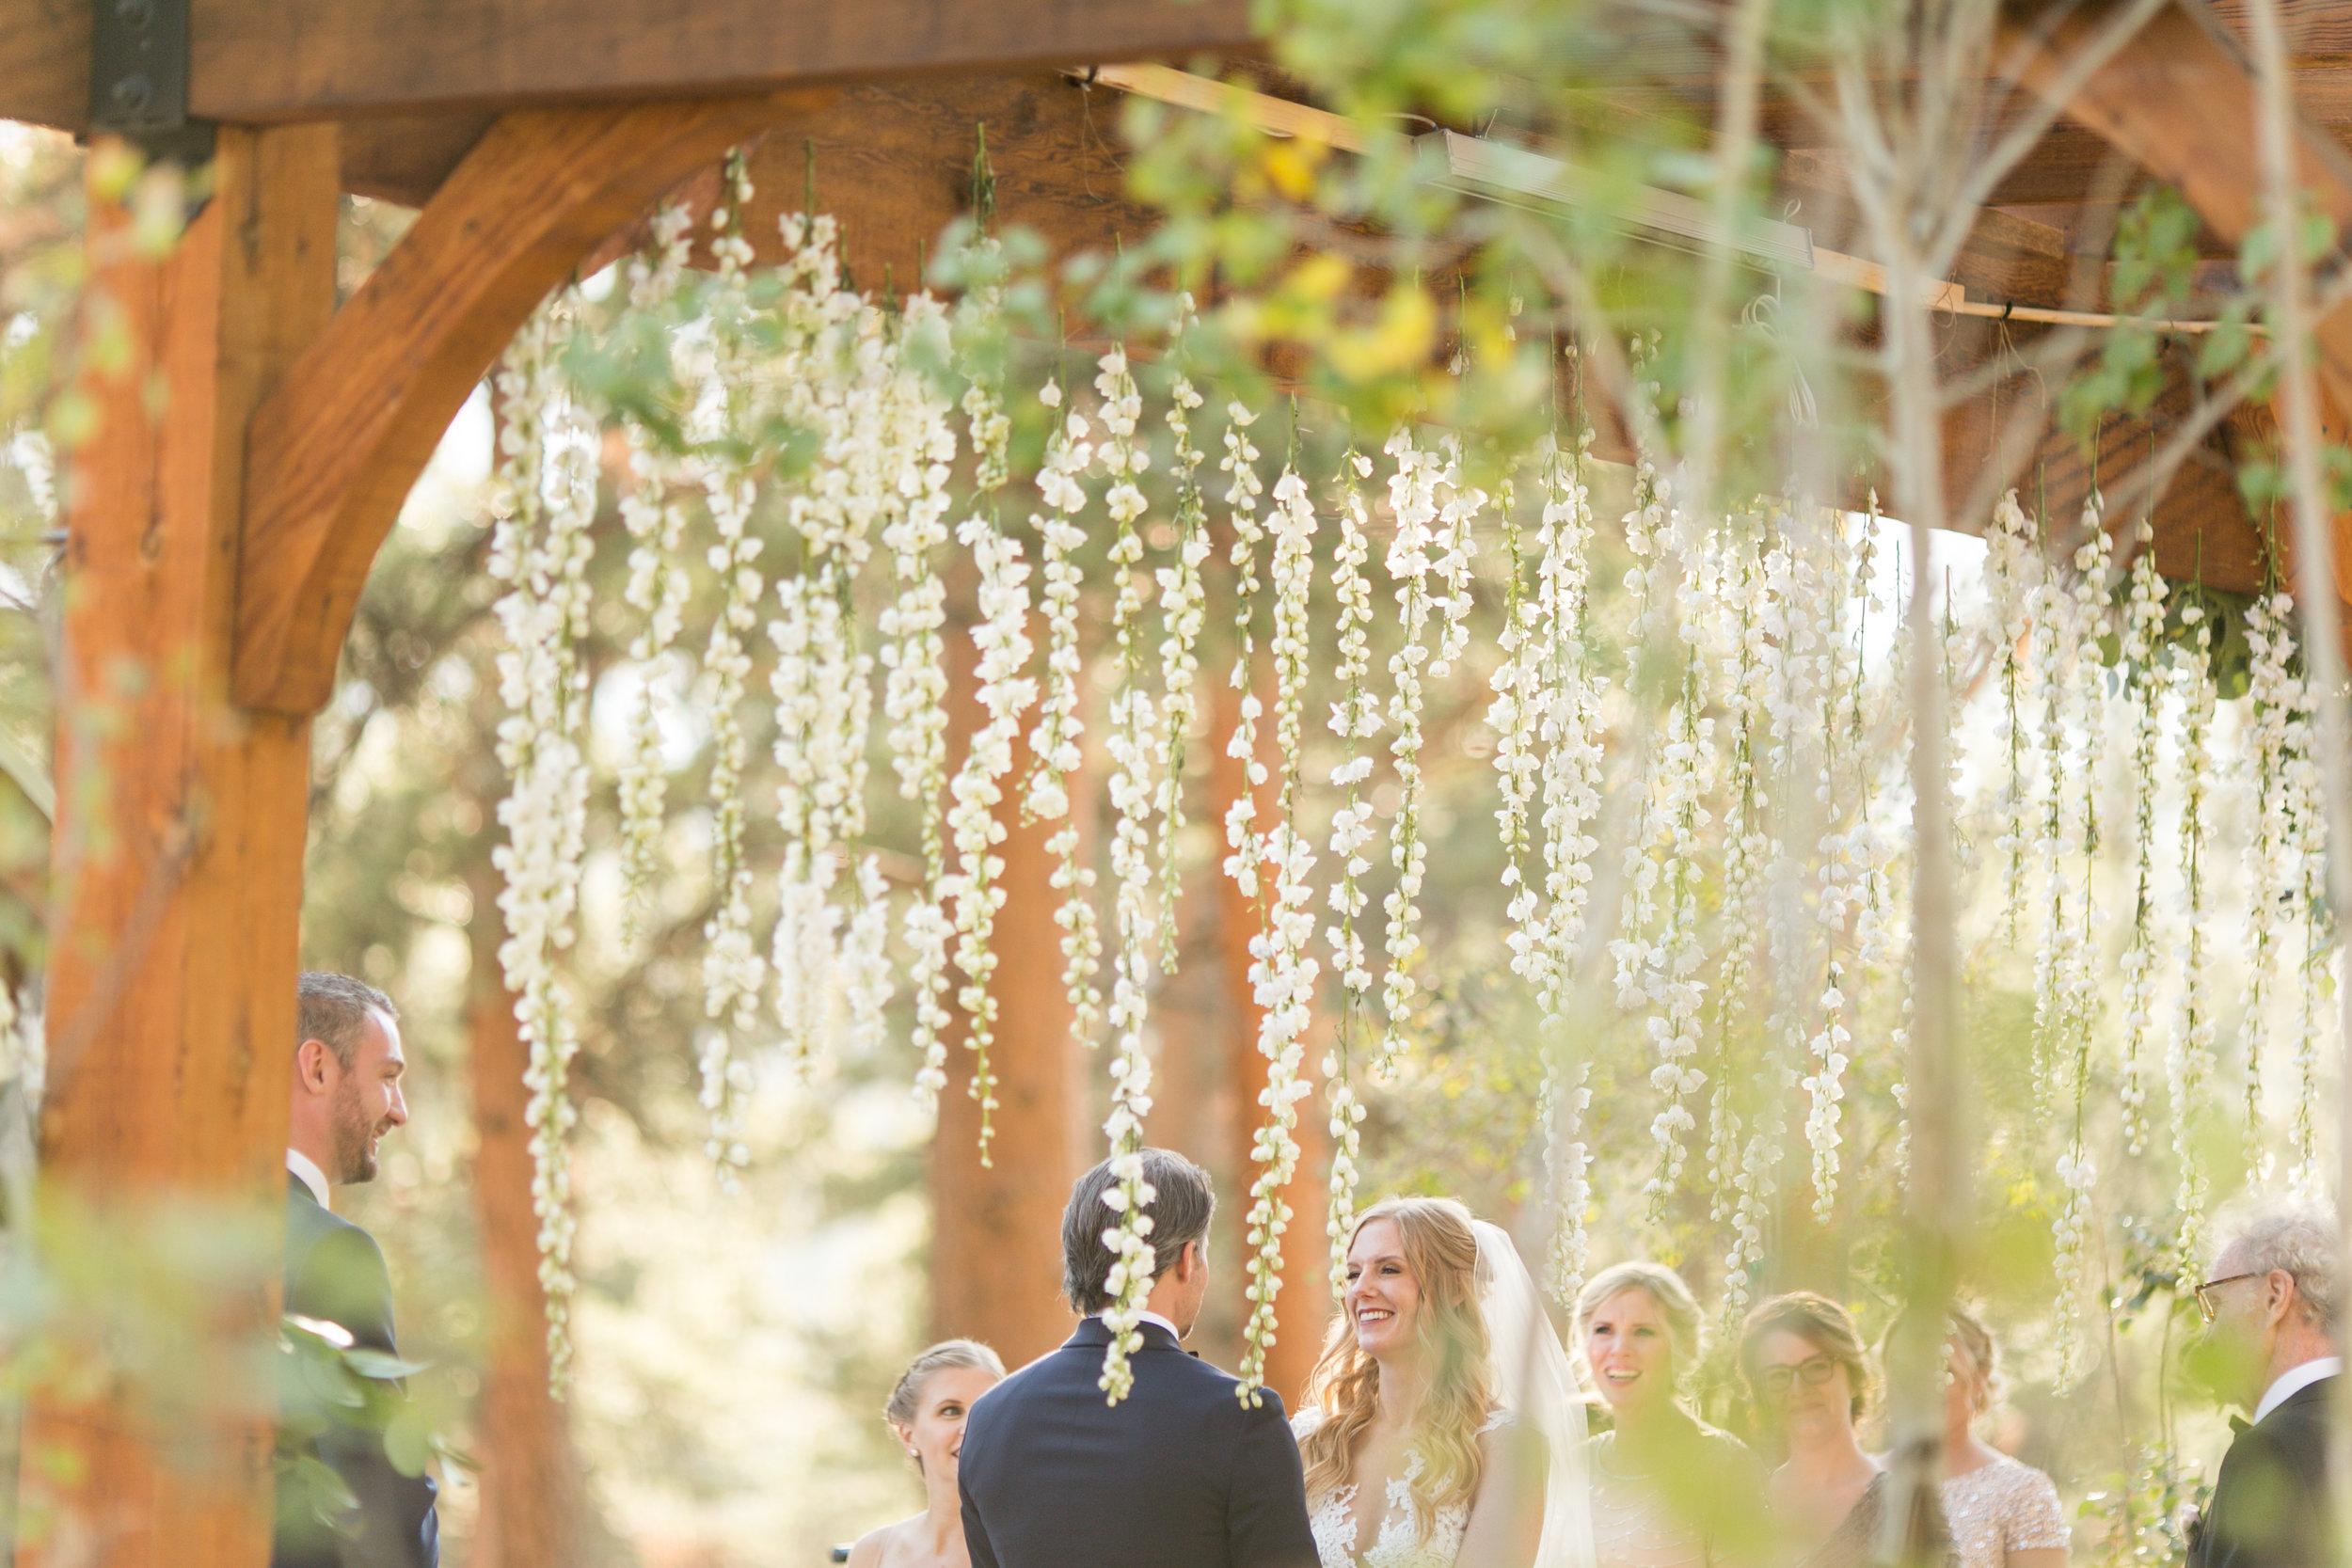 Annie-and-Michael-Estes-Park-wedding-by-Lisa-ODwyer-527.jpg